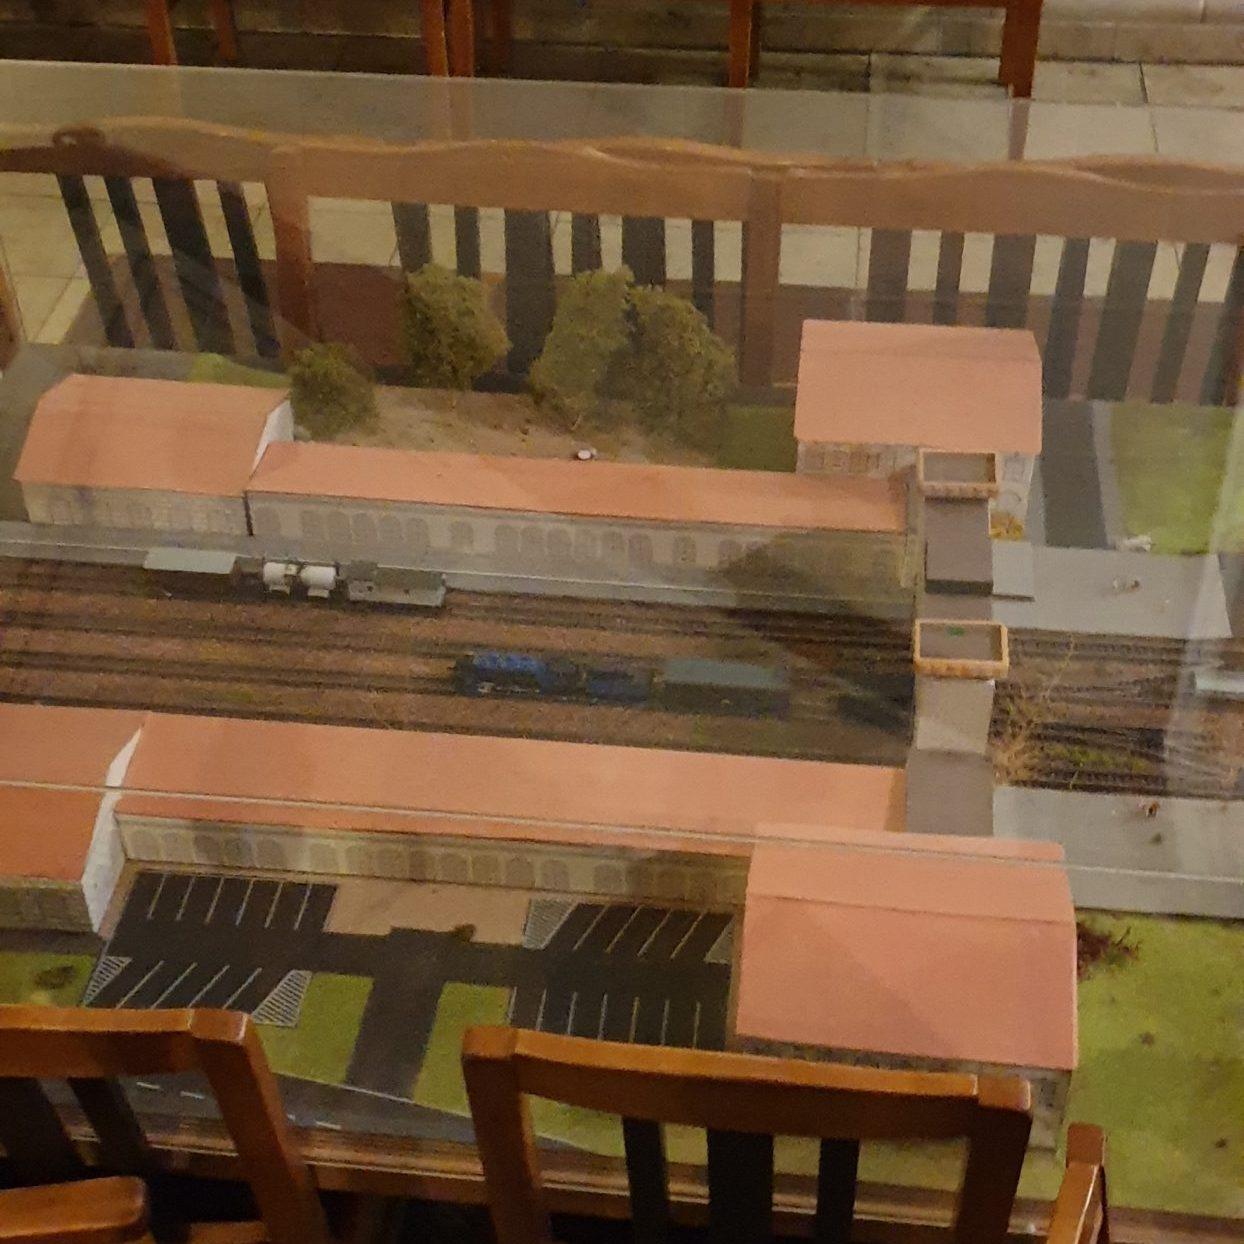 Modell des Bahnhofs